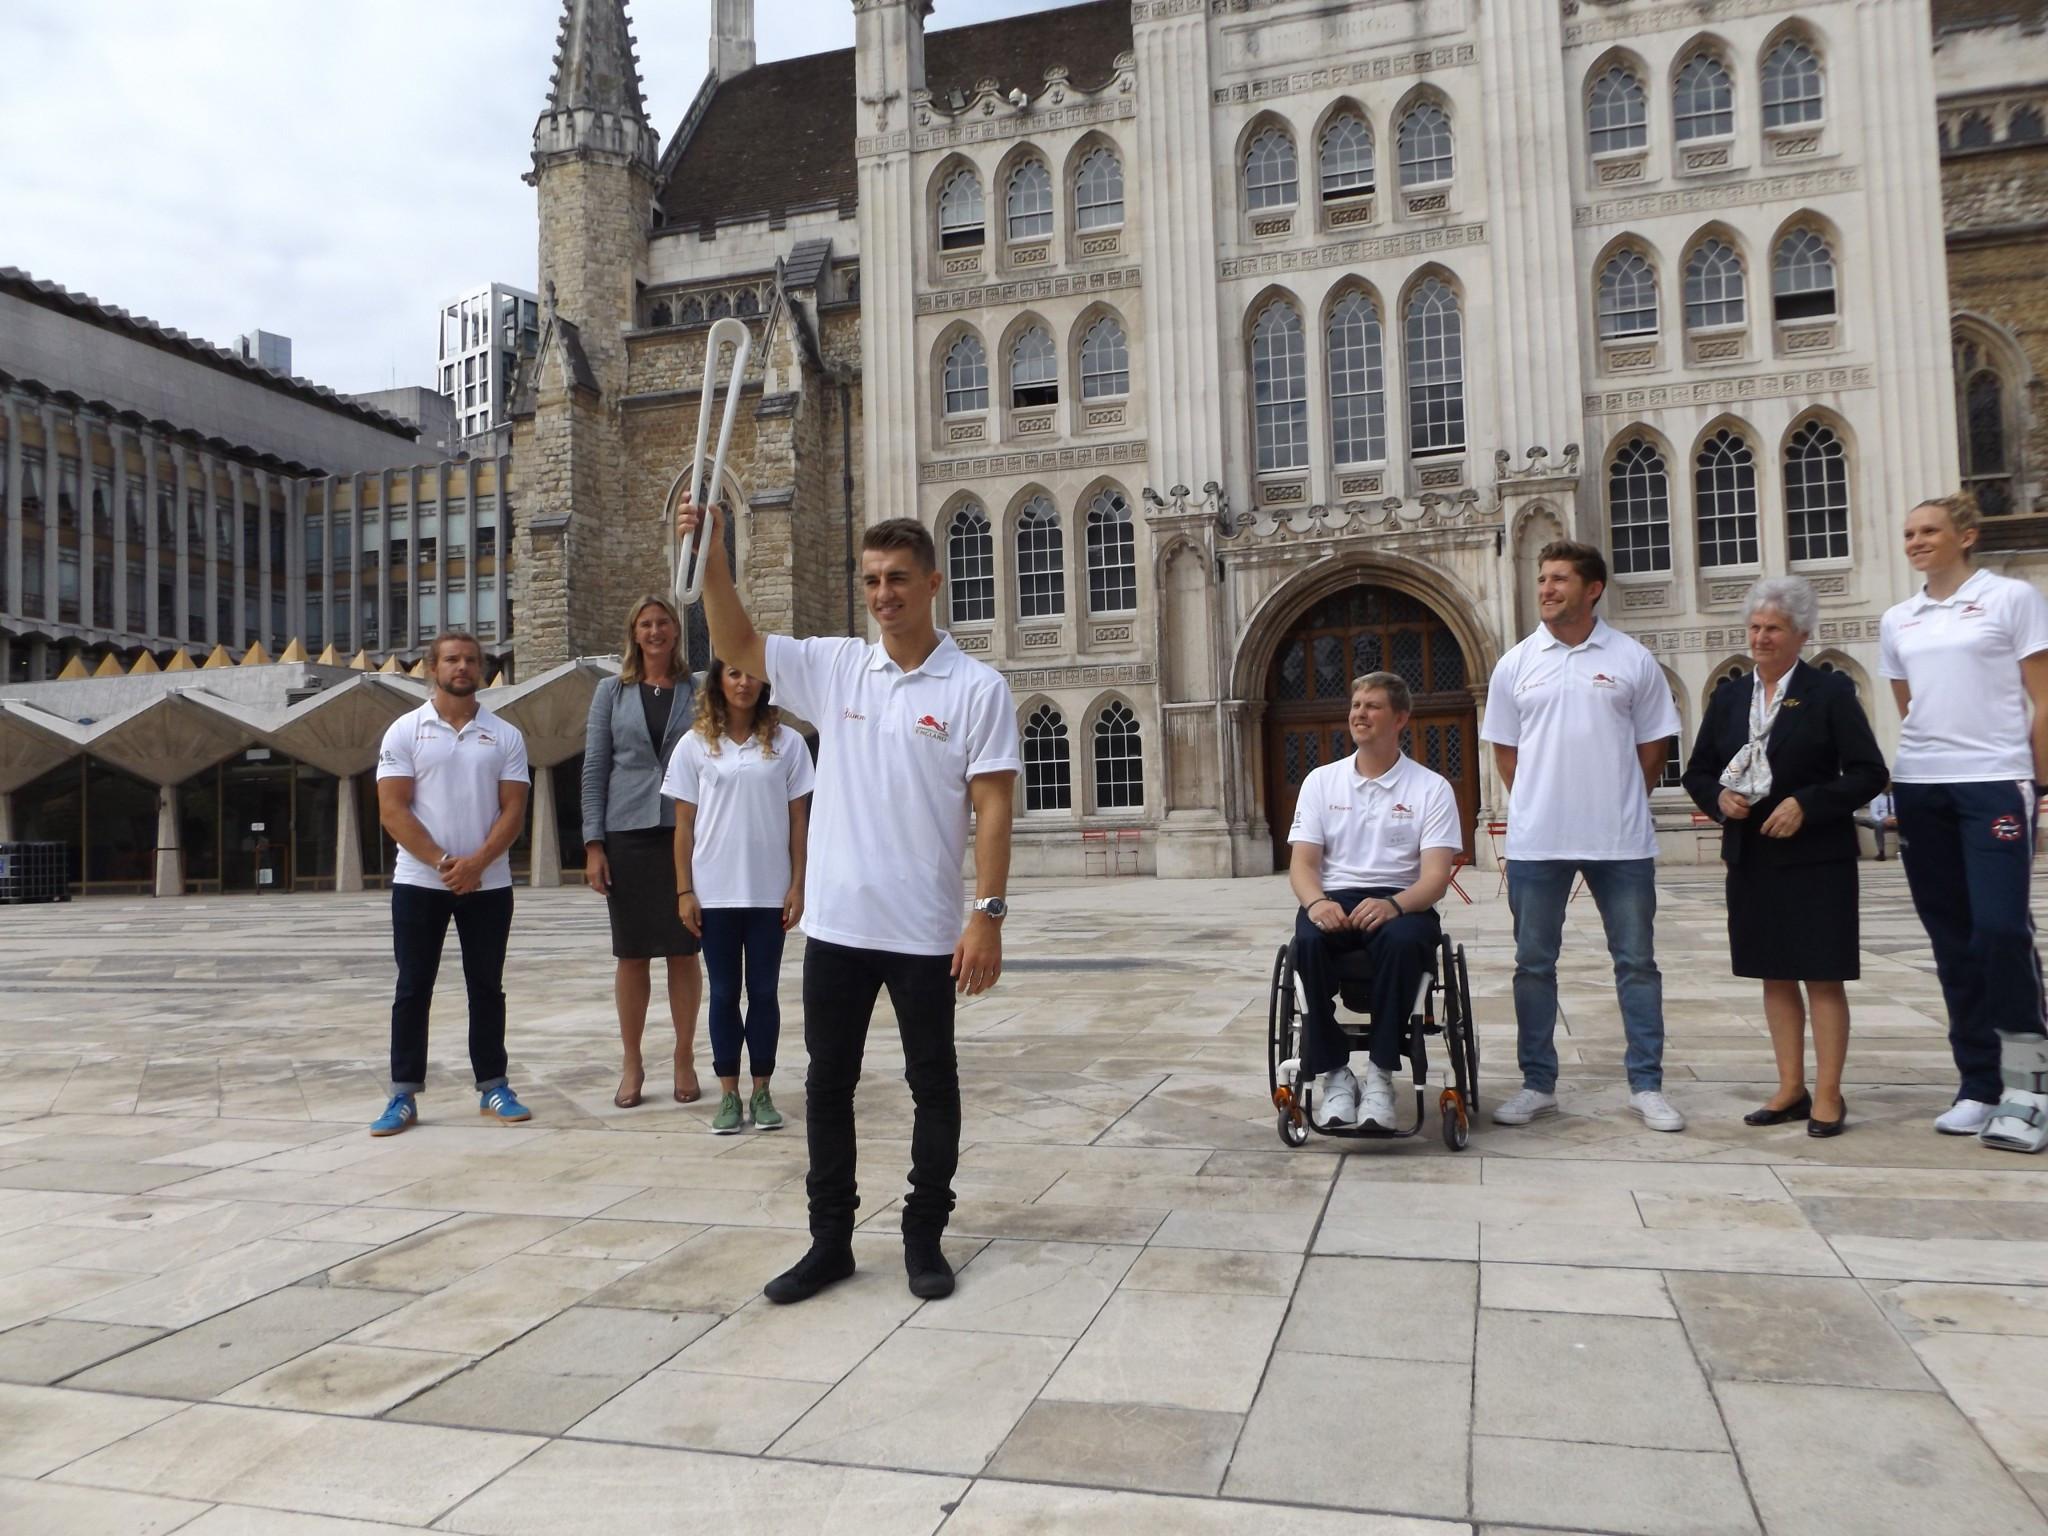 Whitlock among Queen's Baton bearers as Relay returns to London